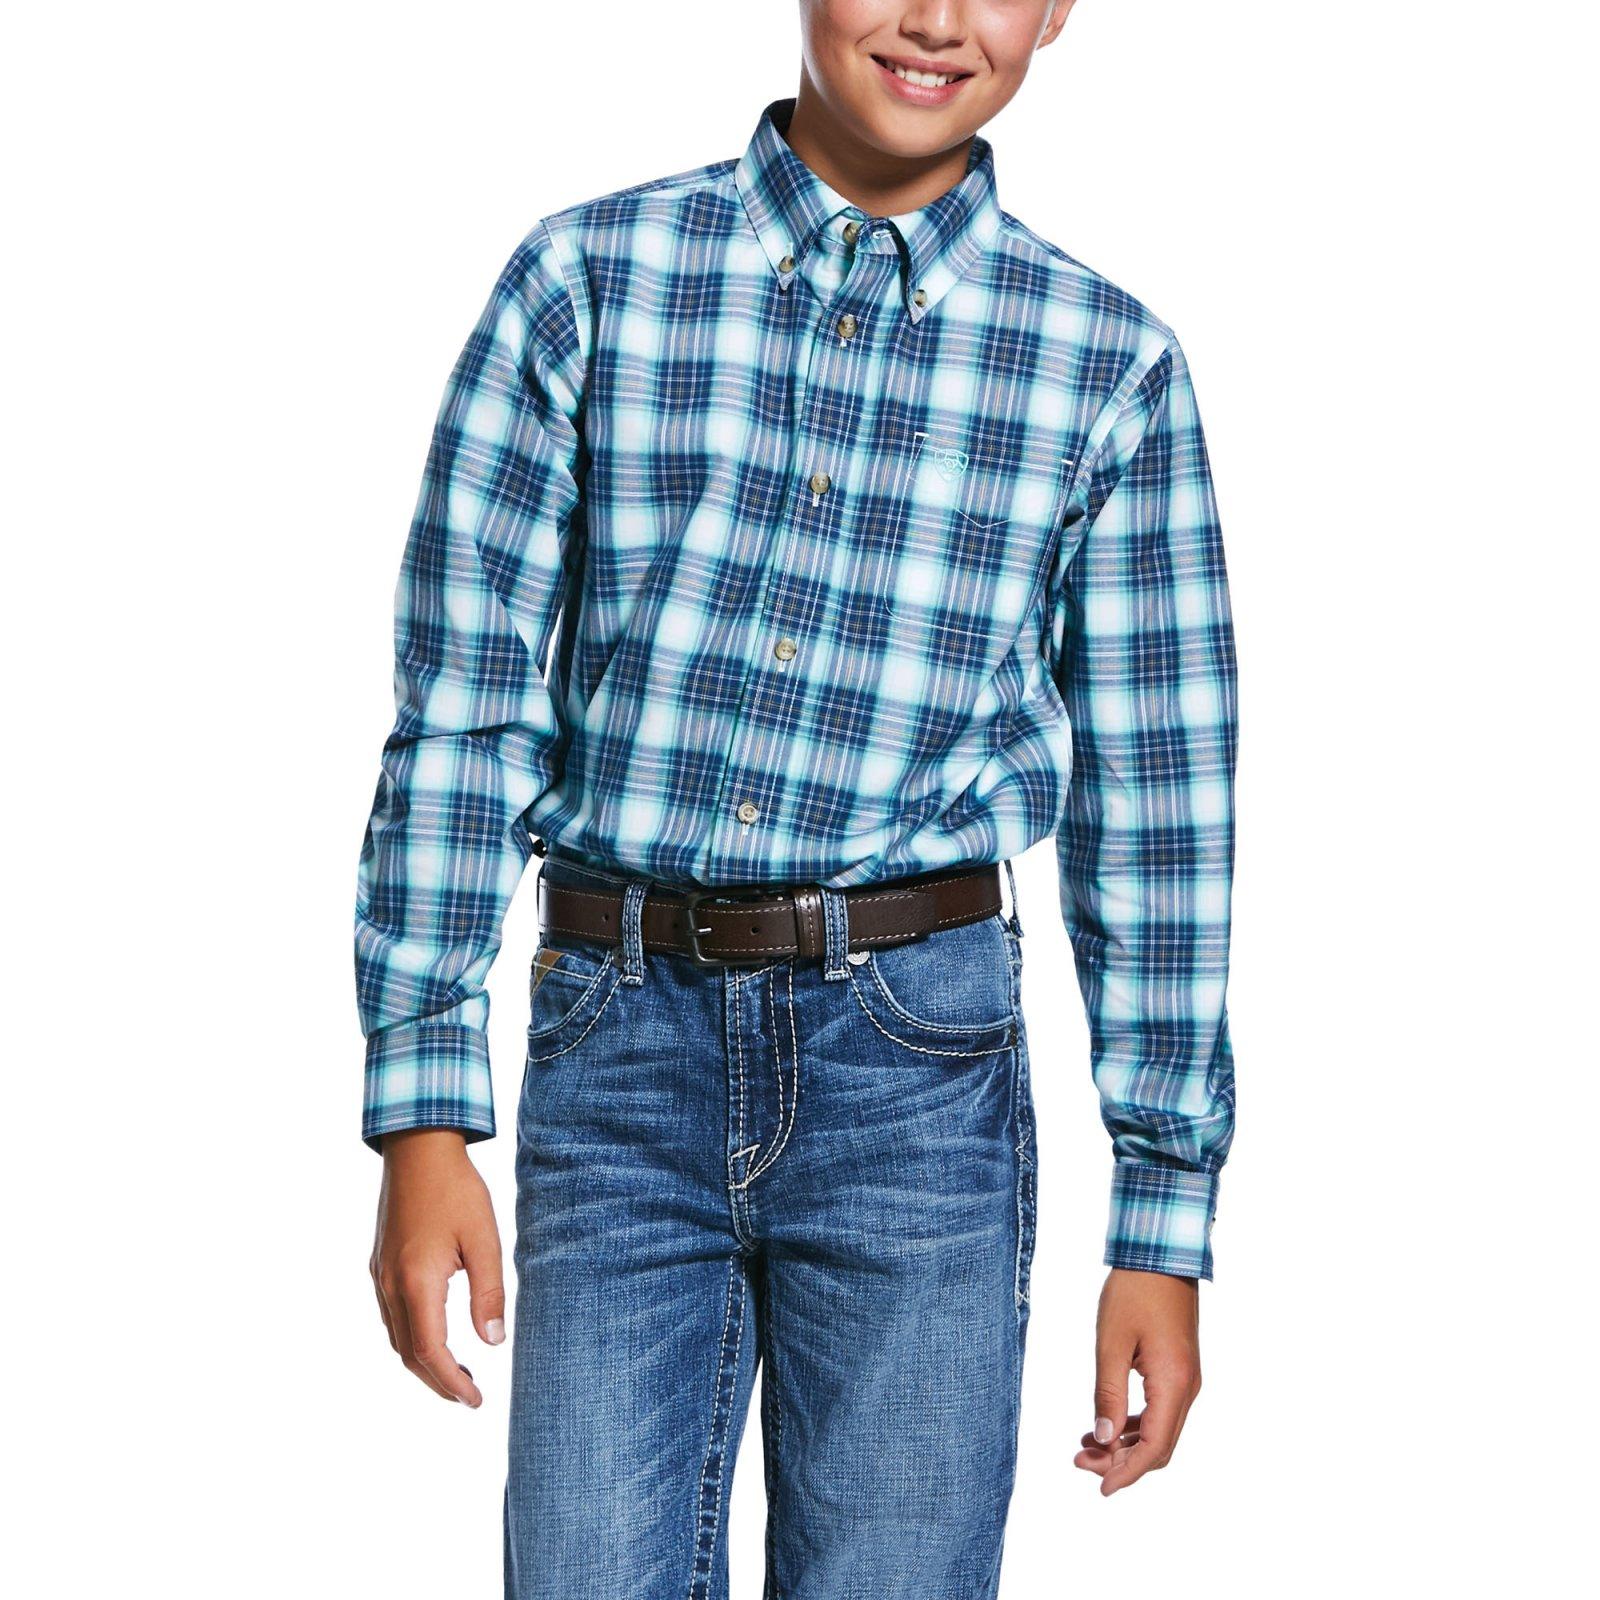 Boys Roselle Shirt from Ariat